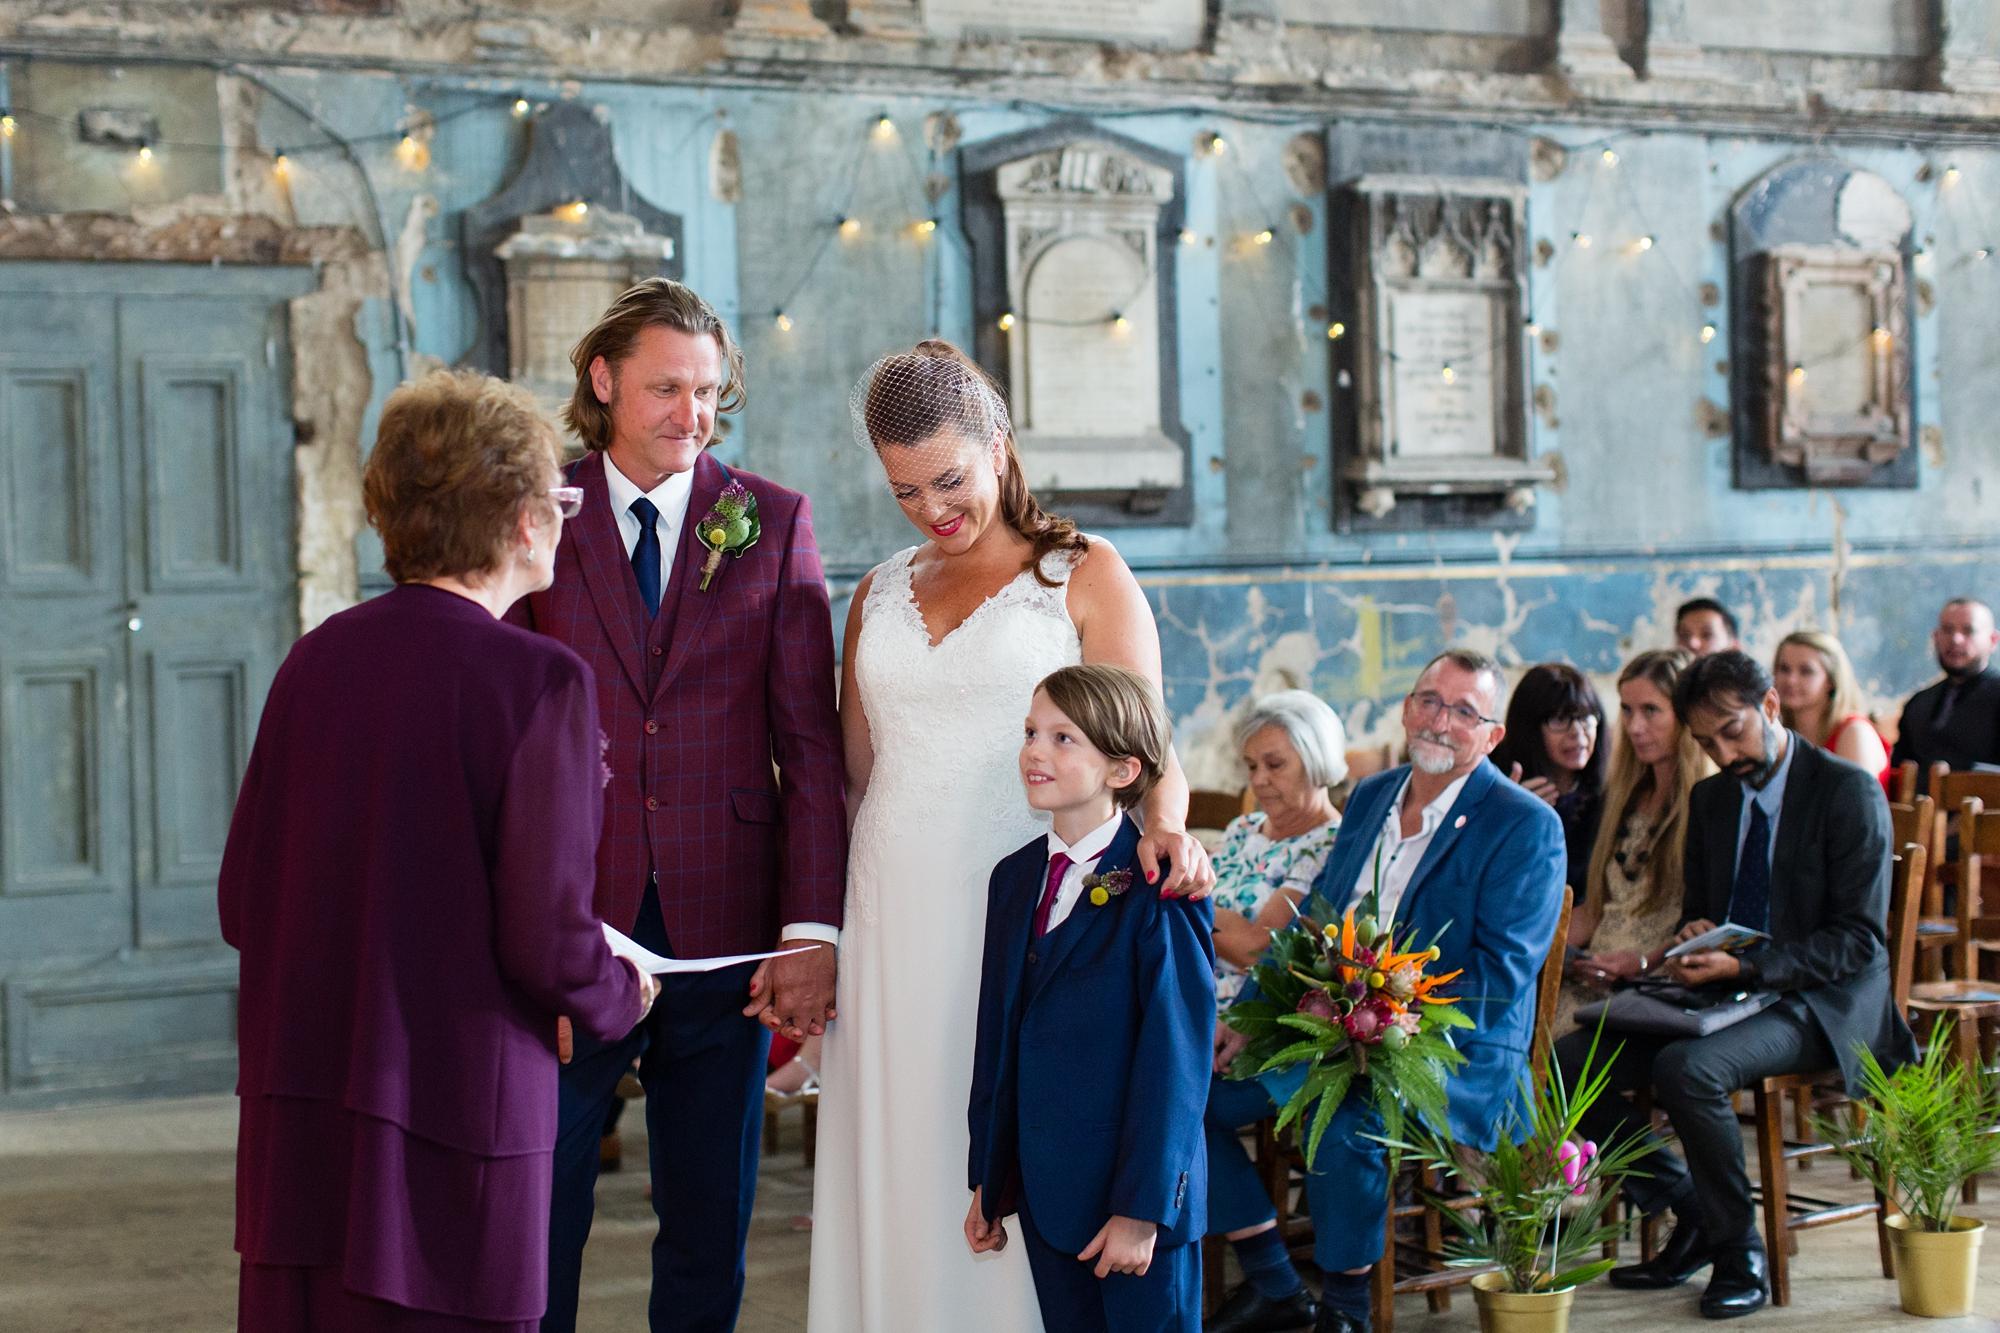 Son in wedding ceremony at Asylum in London